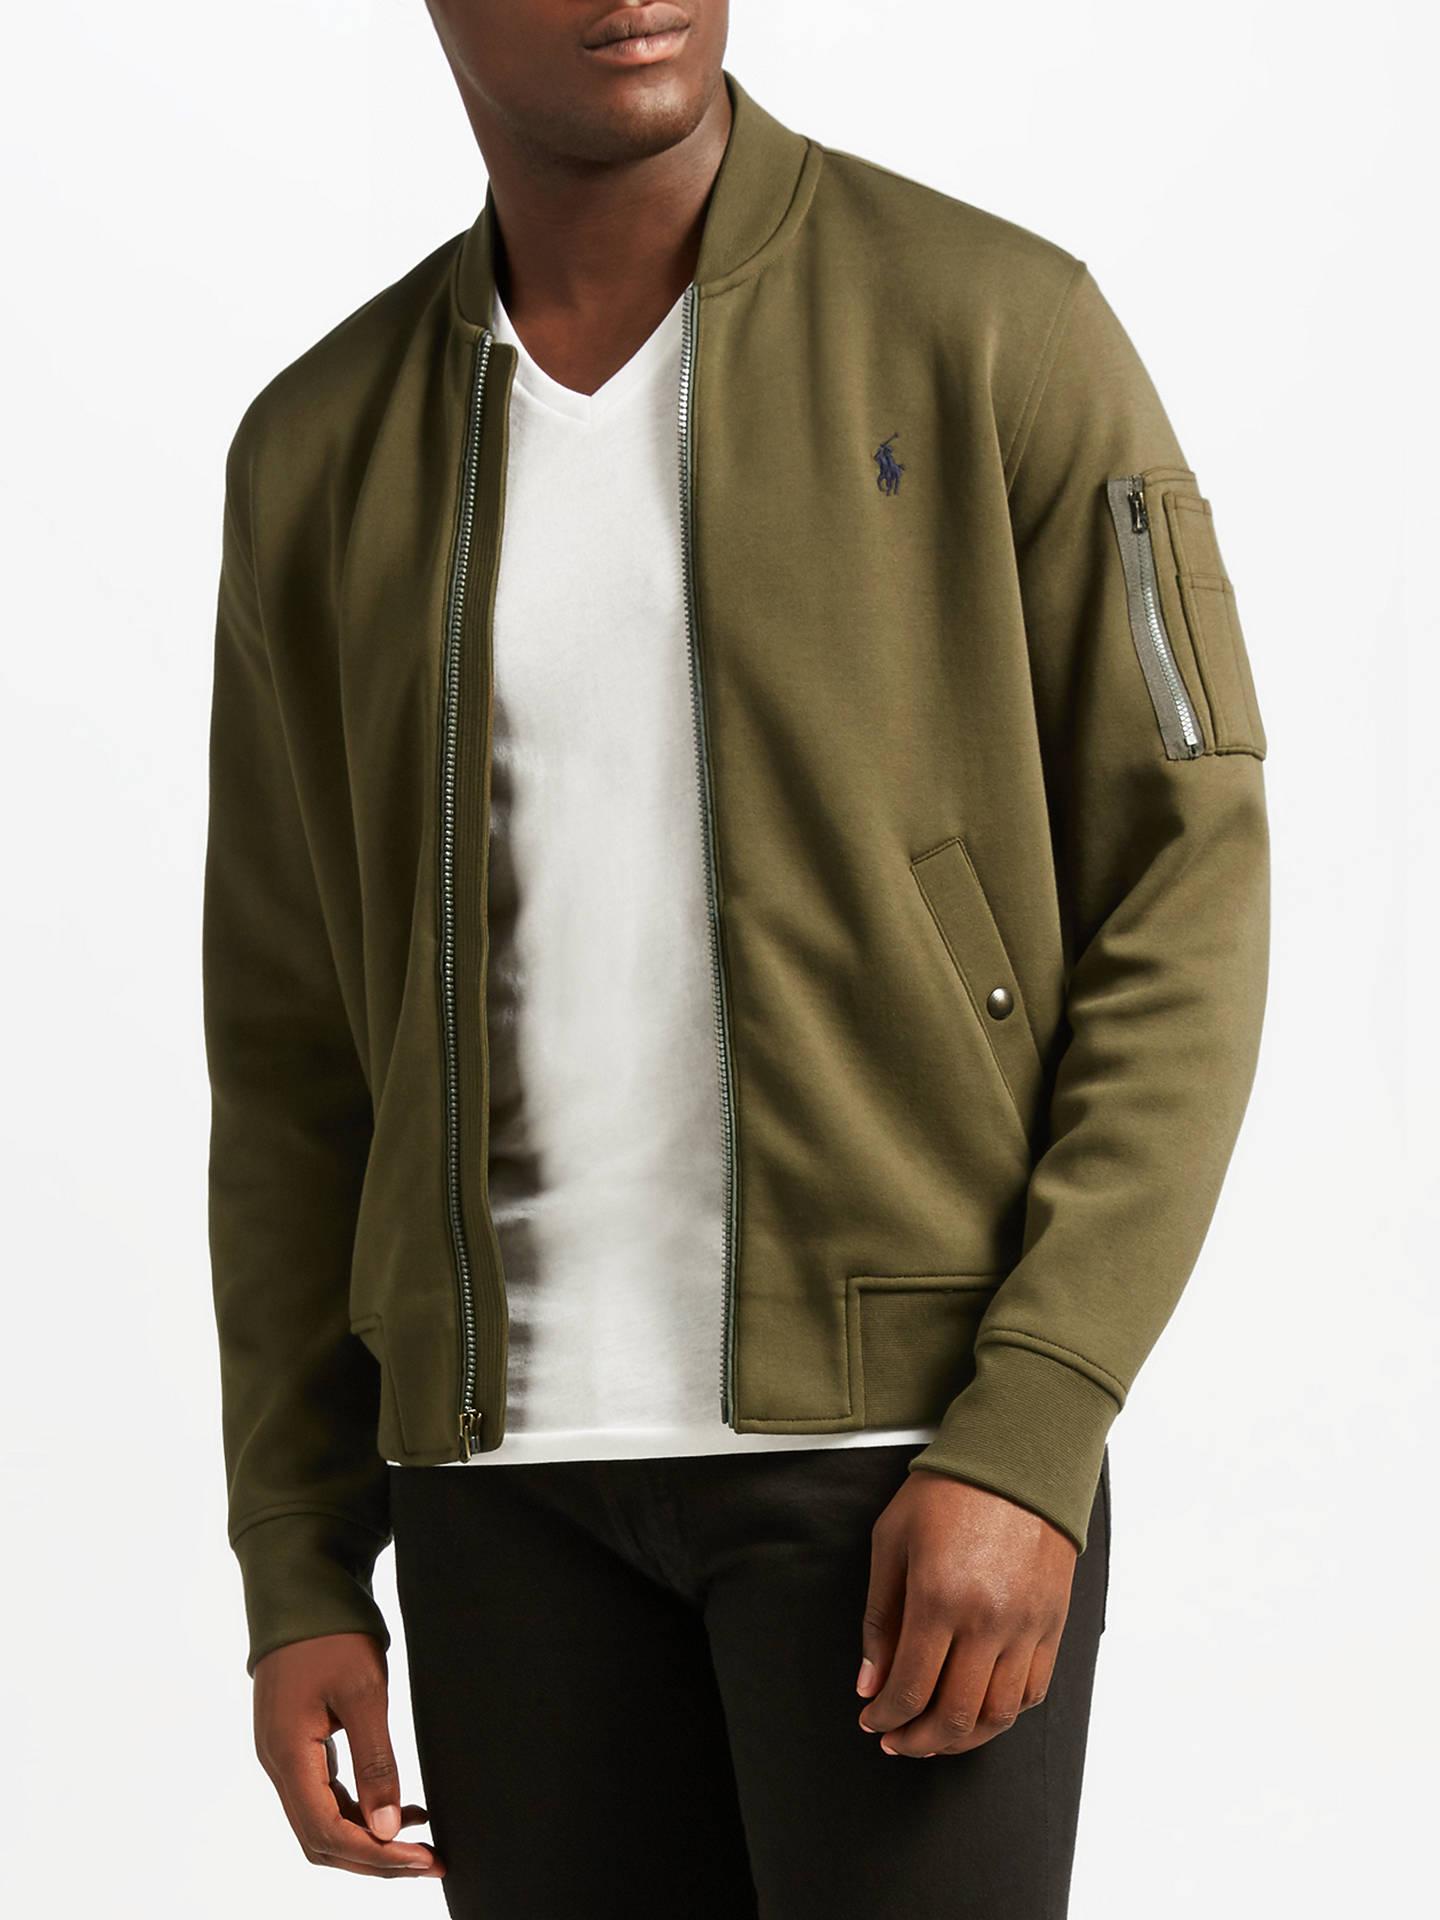 1dc1ecbae Polo Ralph Lauren Long Sleeve Jacket, Company Olive at John Lewis ...